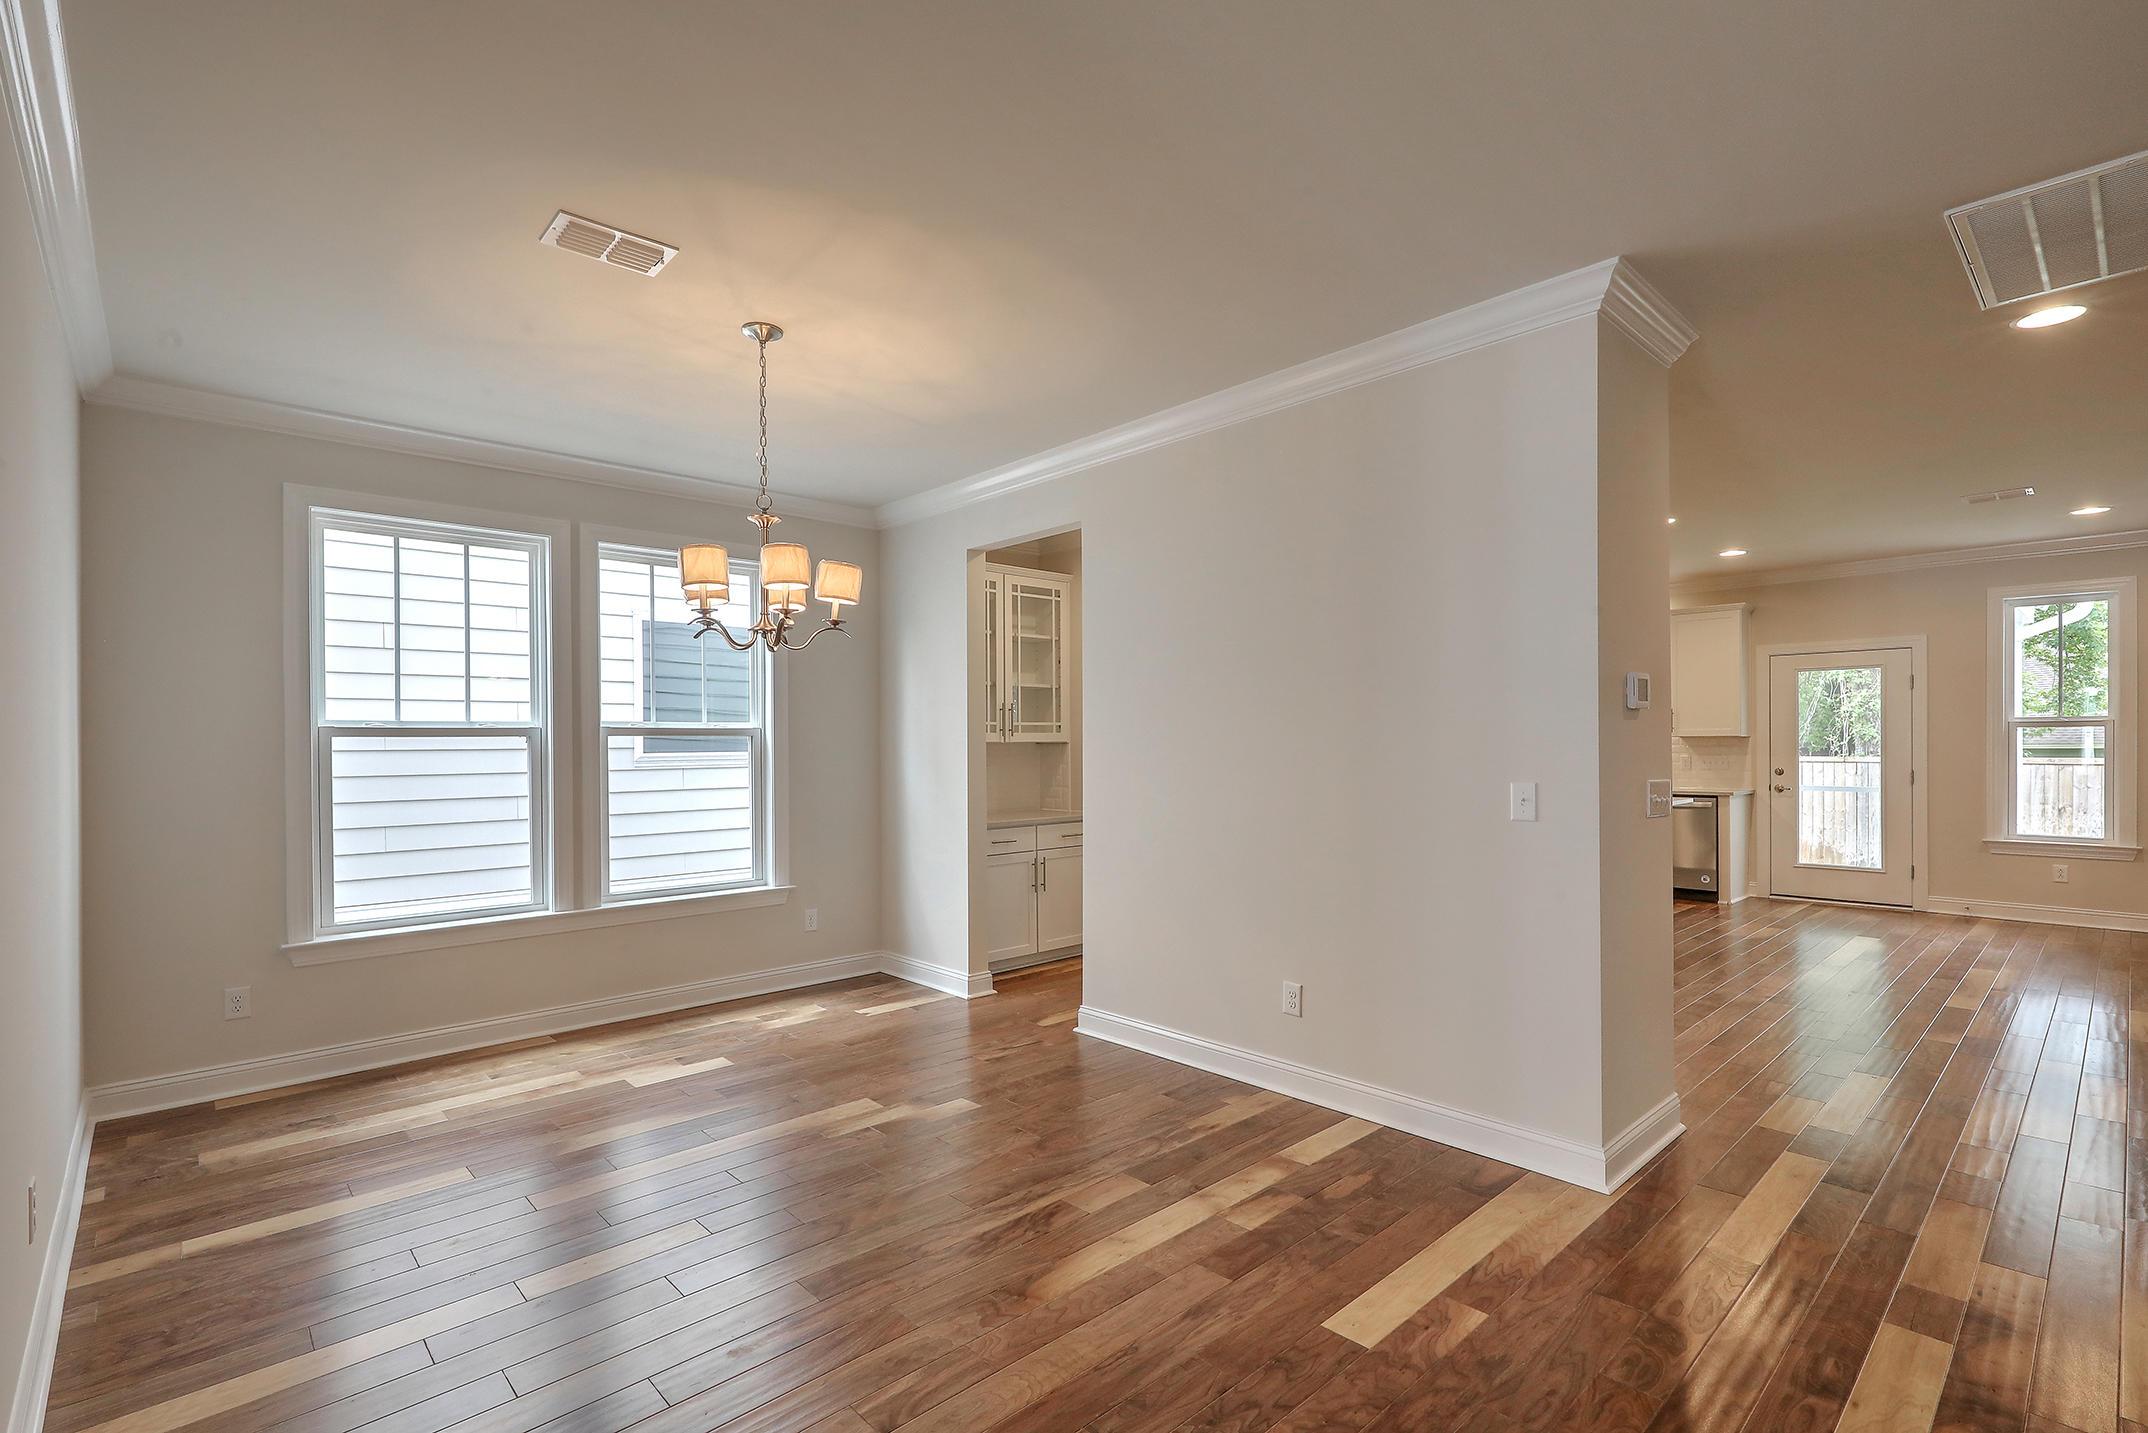 Bentley Park Homes For Sale - 1277 Gannett, Mount Pleasant, SC - 27